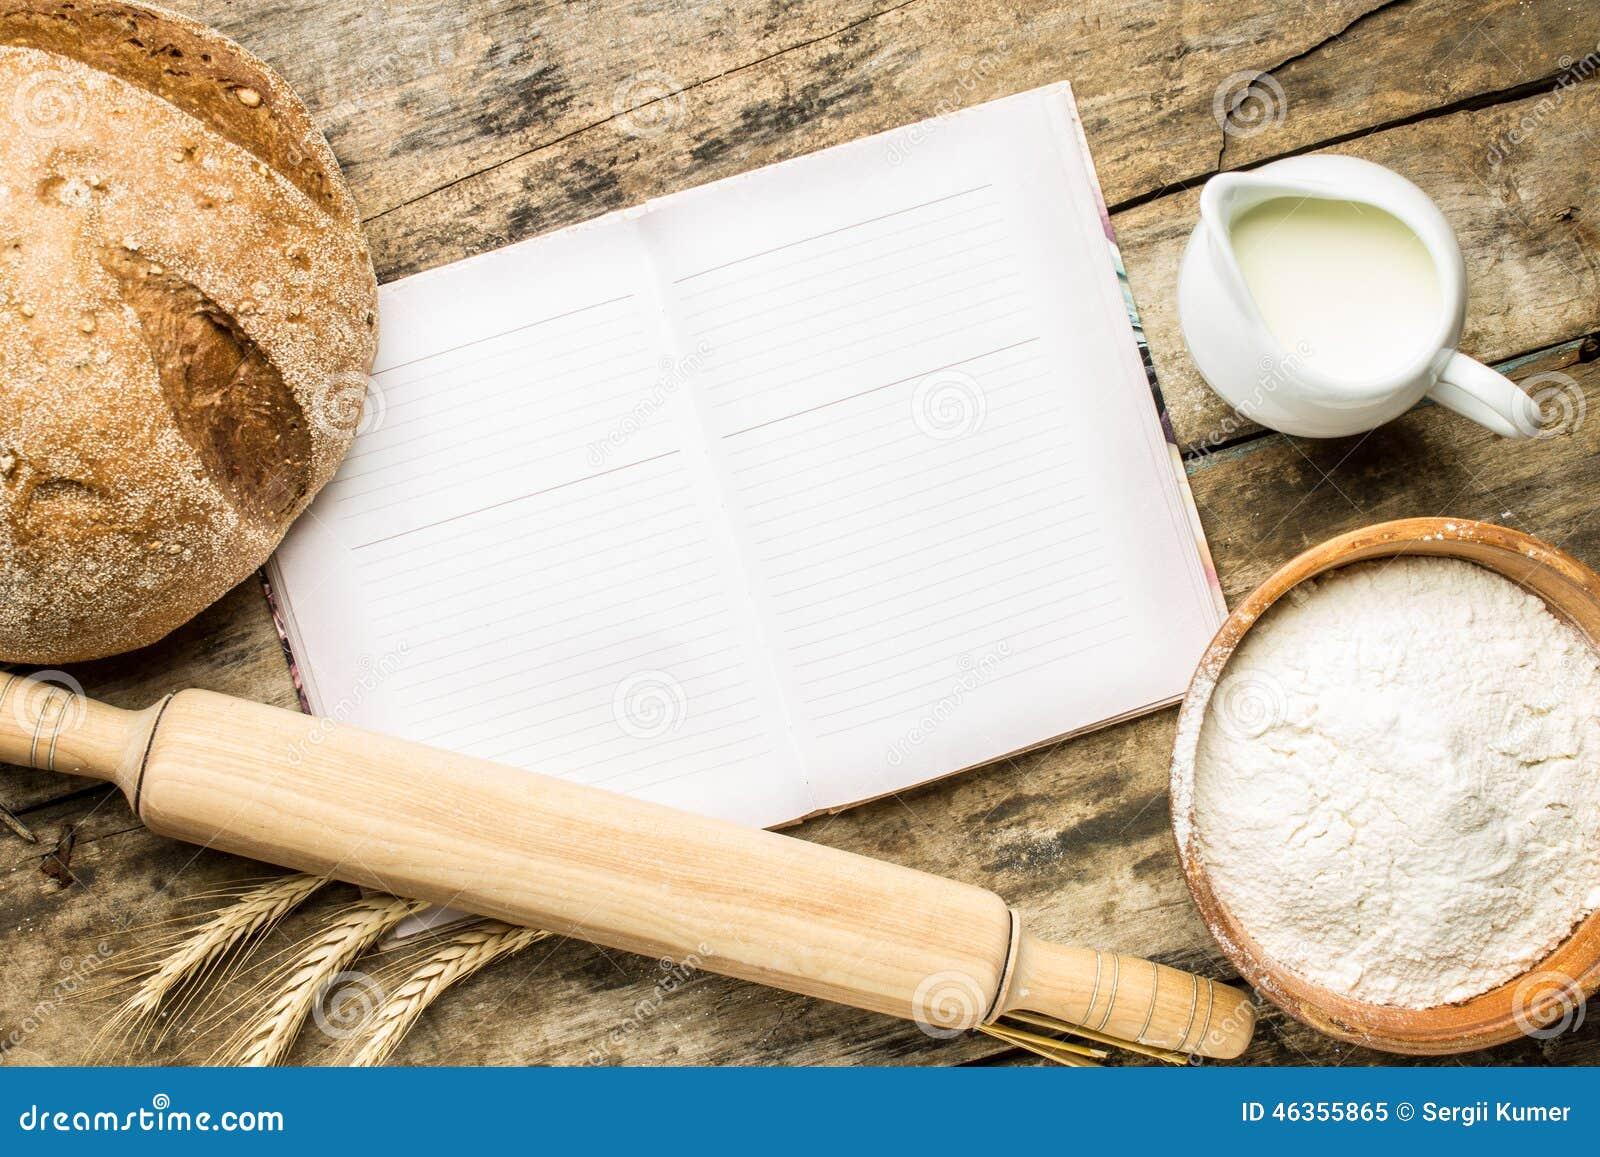 Opened Cookbook With Bakery Background Stock Photo Image